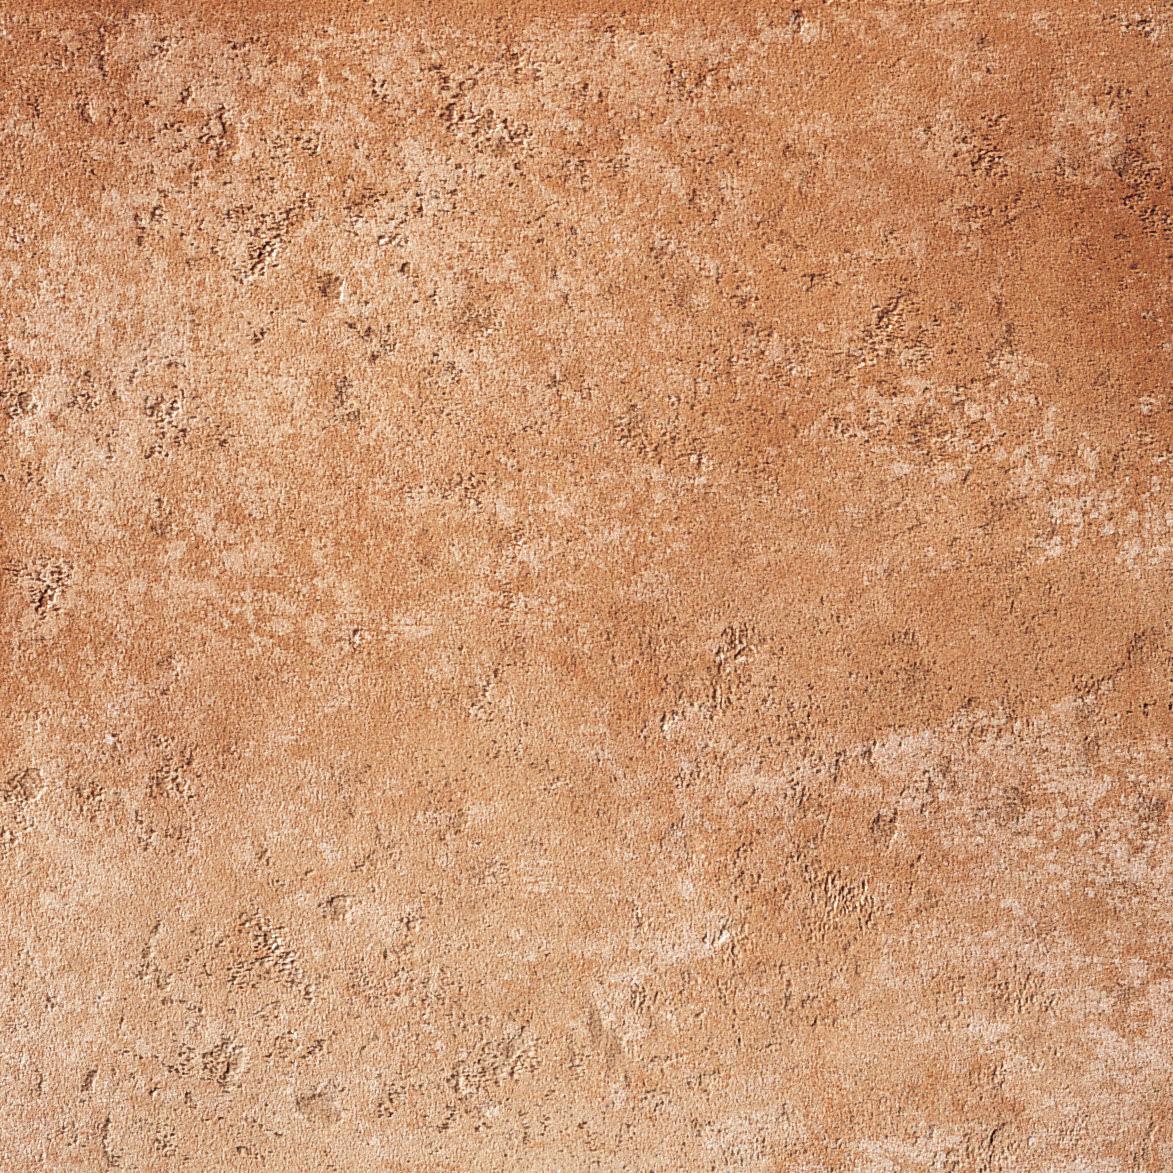 ABK Petraia Ocra 33,3 x 33,3 cm Grip